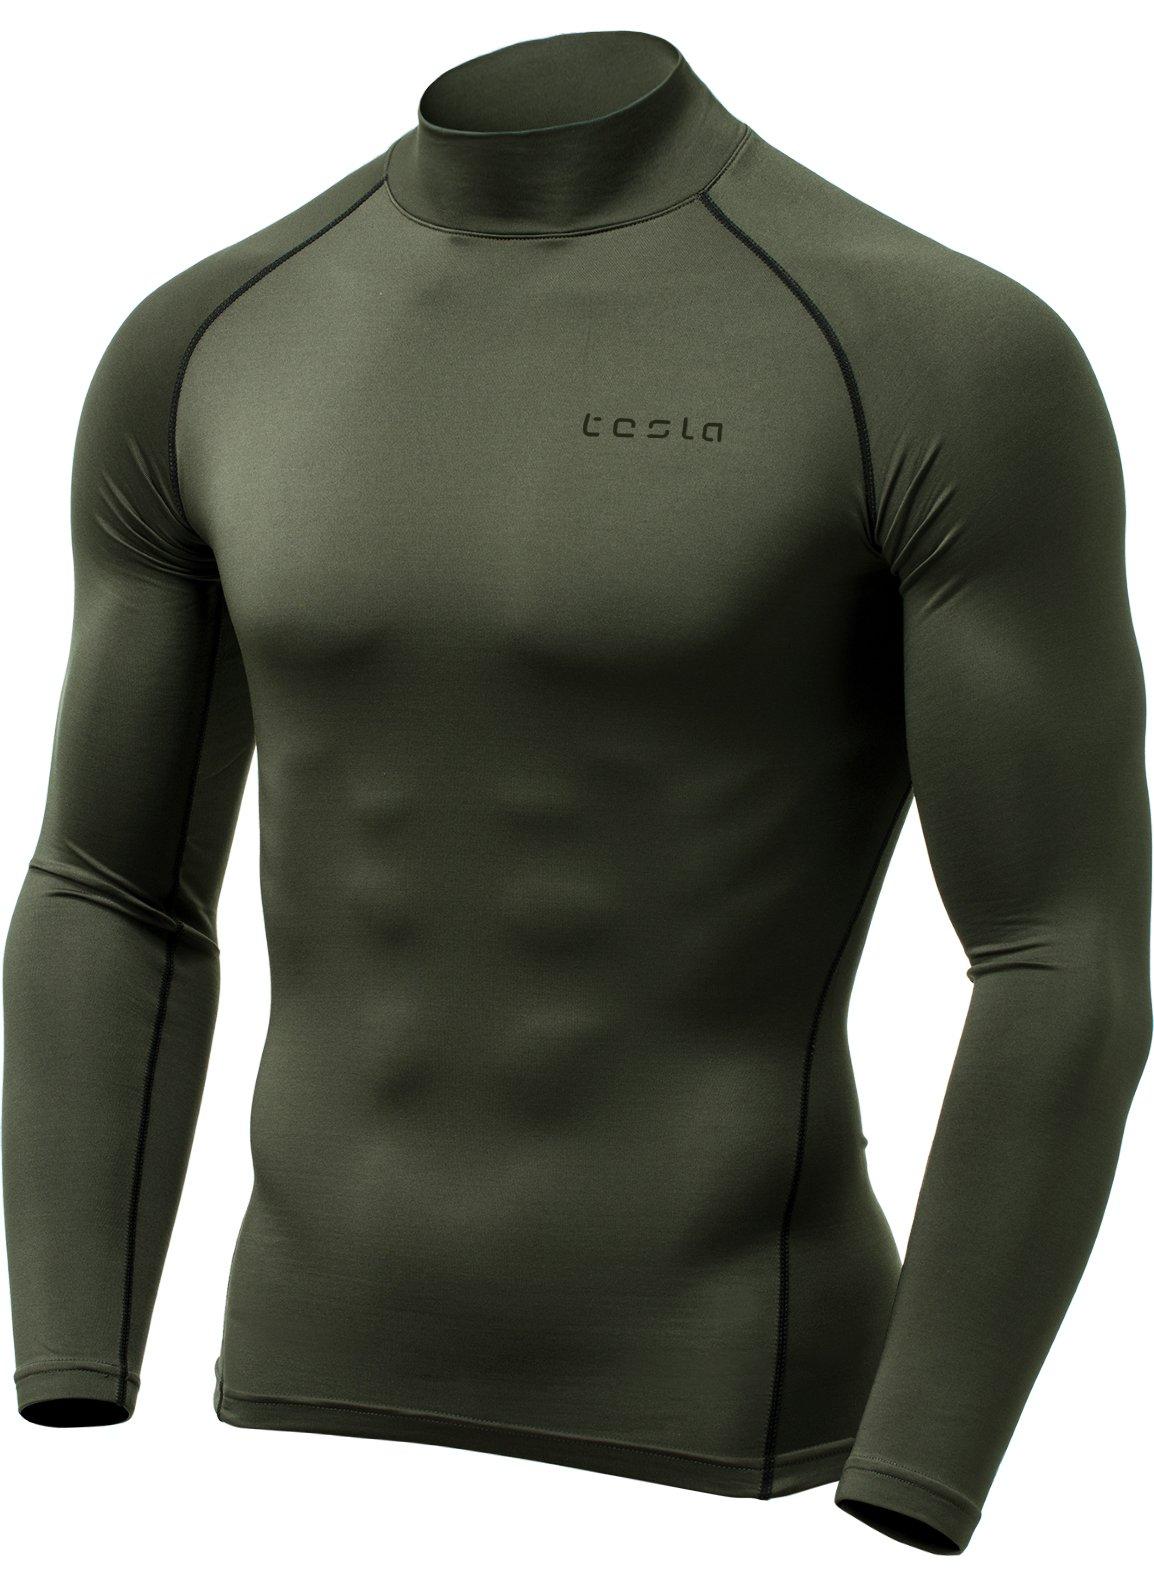 TSLA Men's Thermal Wintergear Compression Baselayer Mock Long Sleeve Shirt, Thermal Mock Neck(yut32) - Olive, X-Small